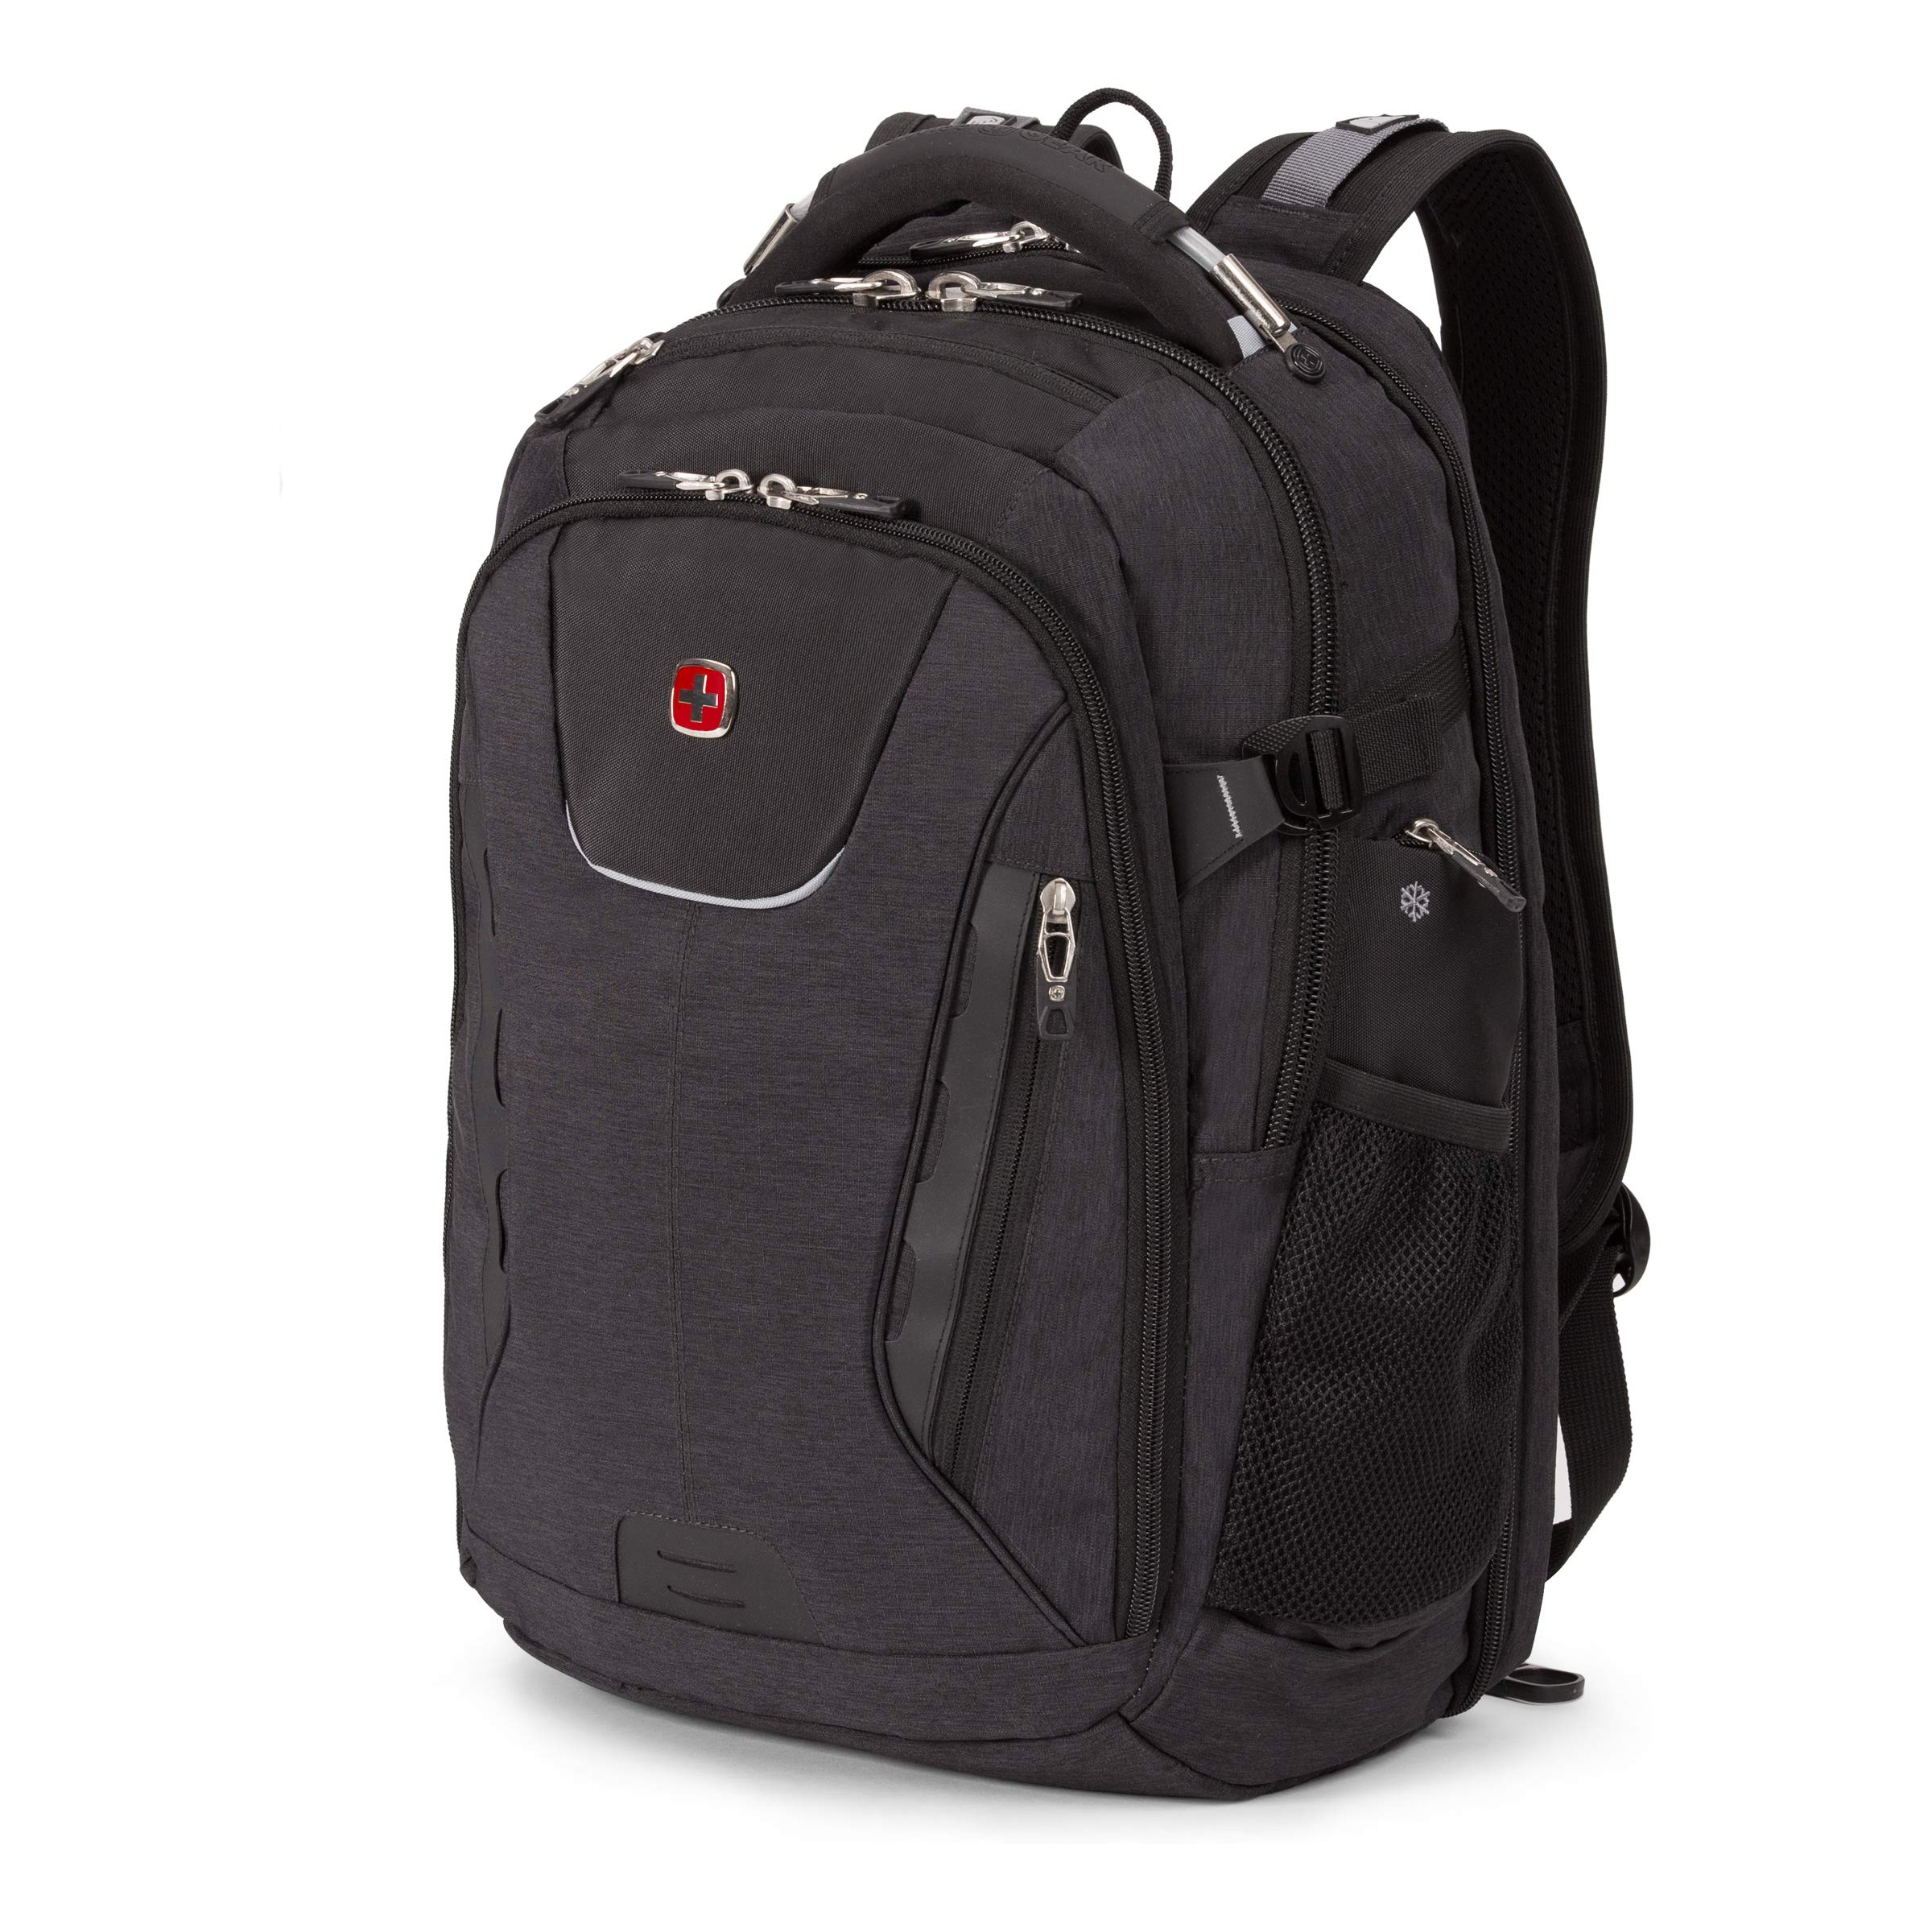 SwissGear 5358 USB ScanSmart Laptop Backpack. Abrasion-Resistant & Travel-Friendly Laptop Backpack (Gray Heather). by SwissGear